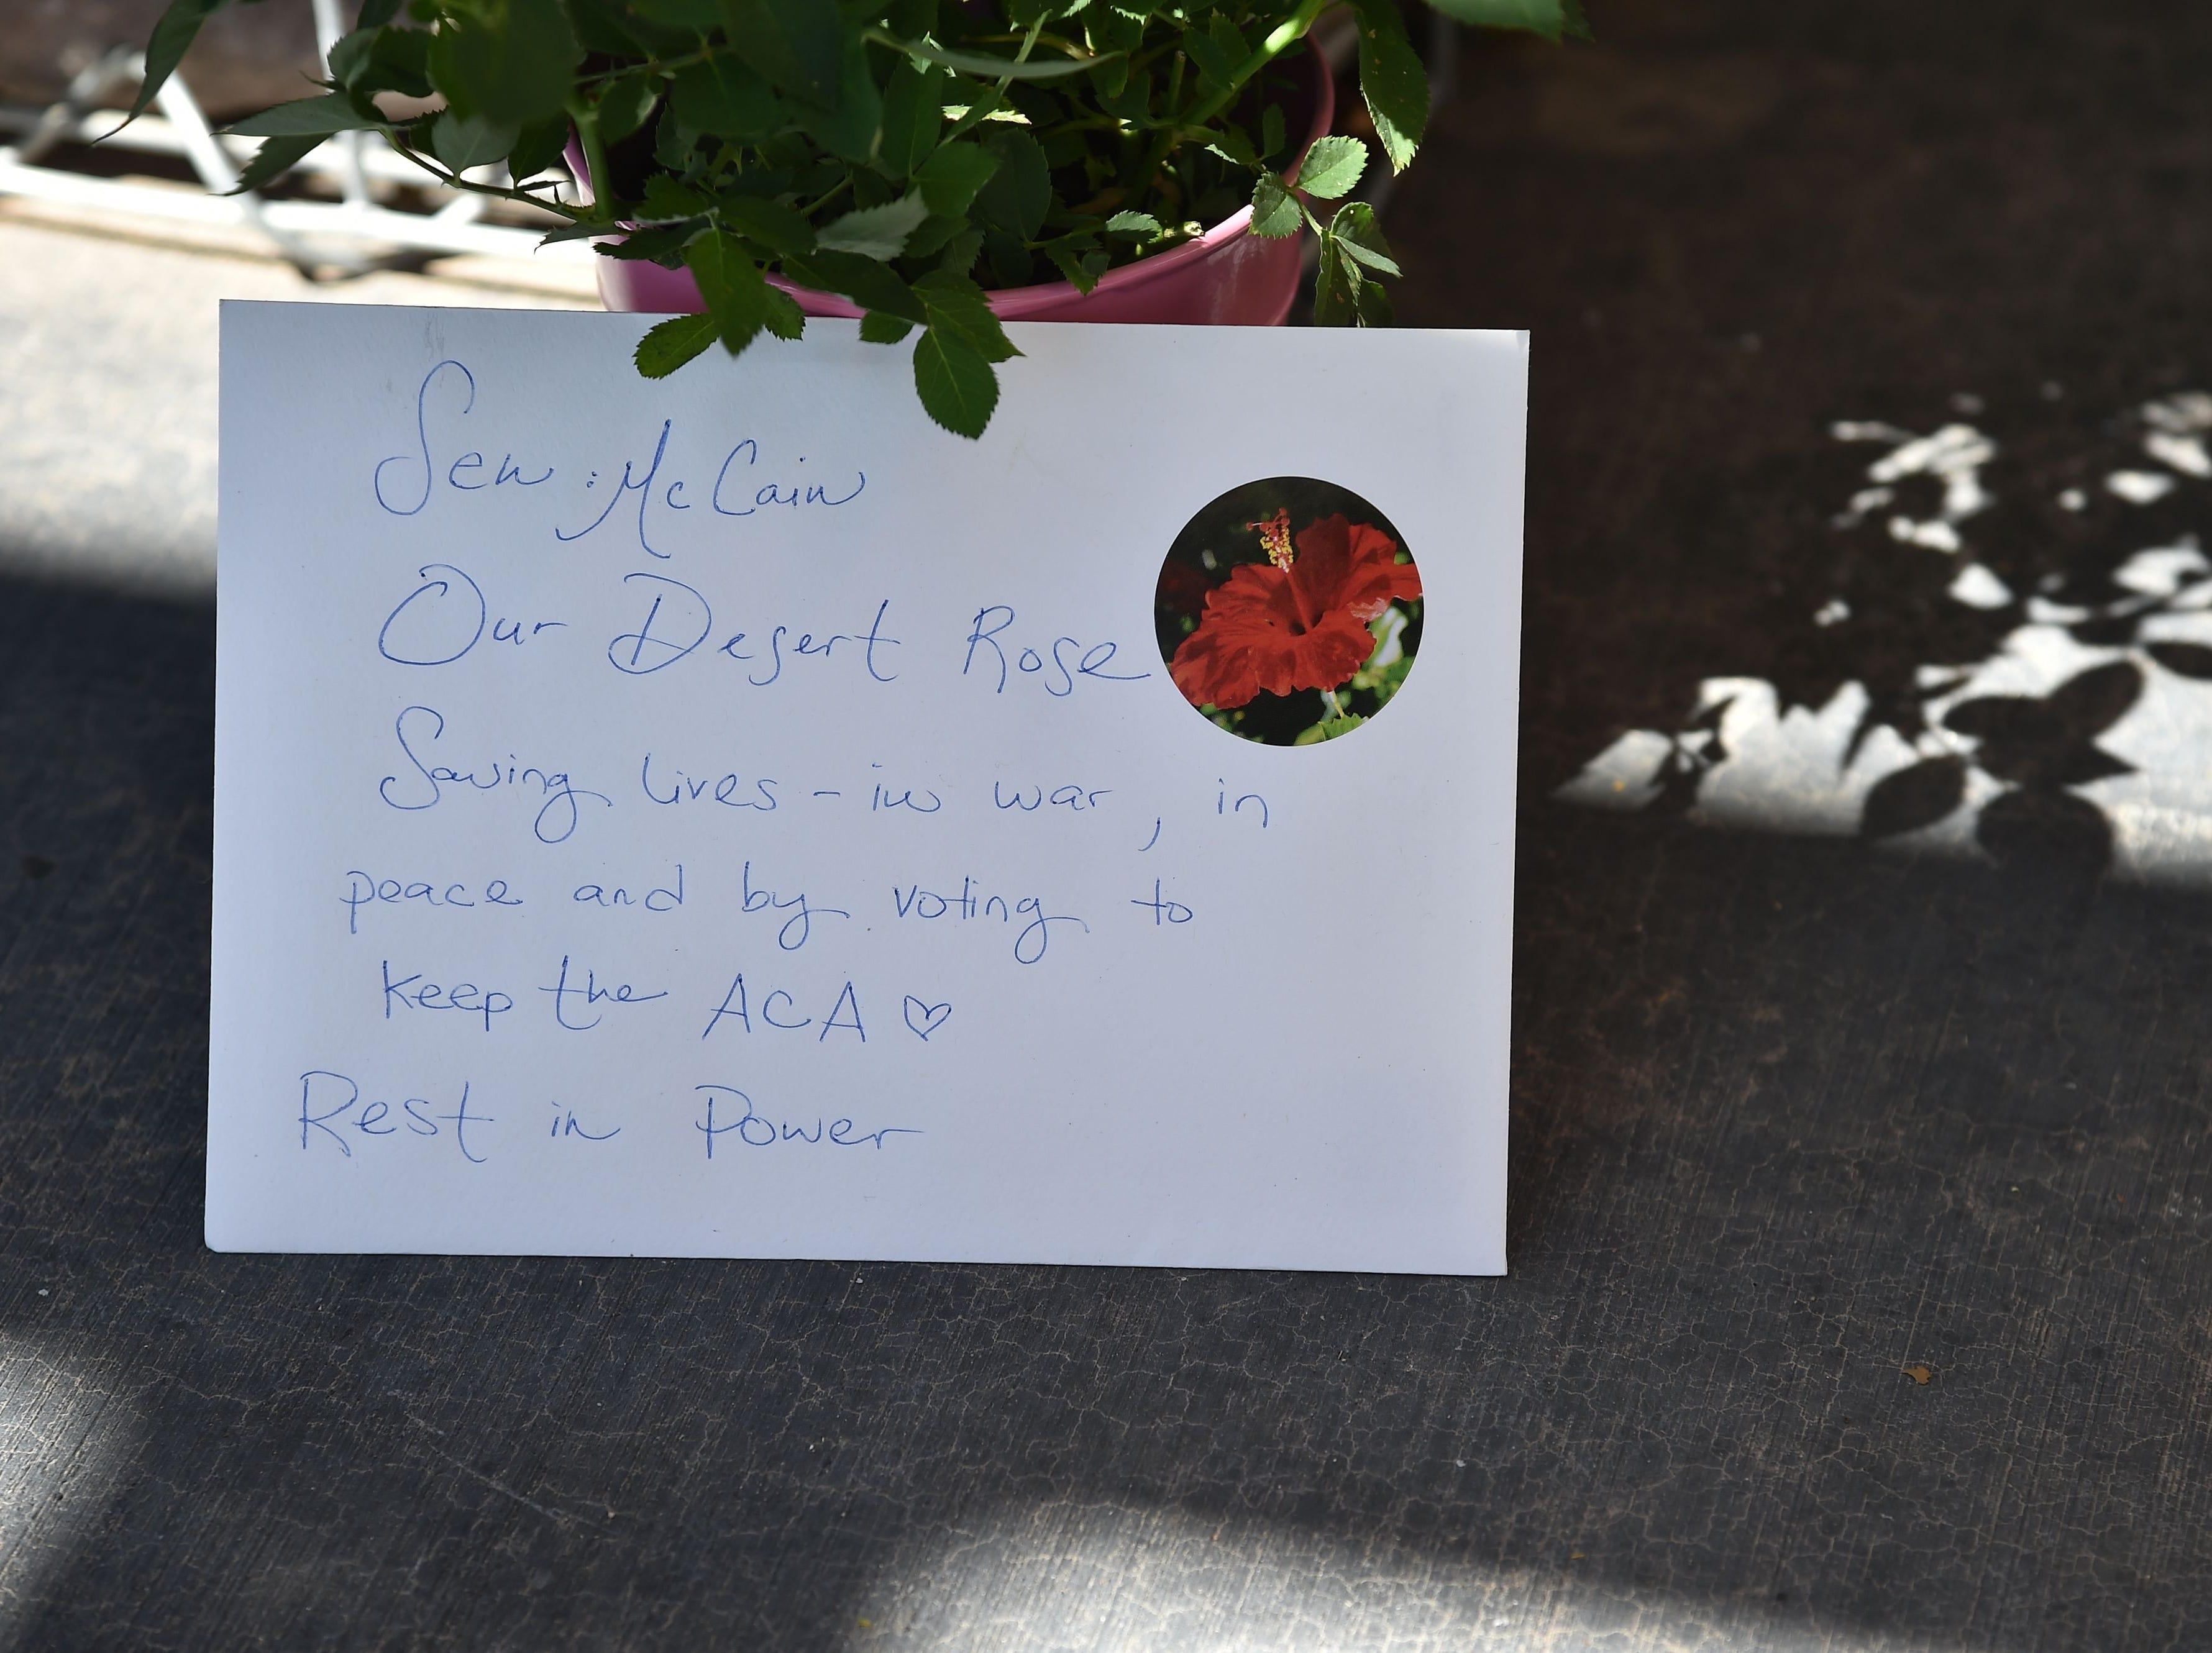 A handwritten note is seen at a makeshift memorial remembering Senator John McCain outside McCain's office in Phoenix, Ariz. Aug. 27, 2018.